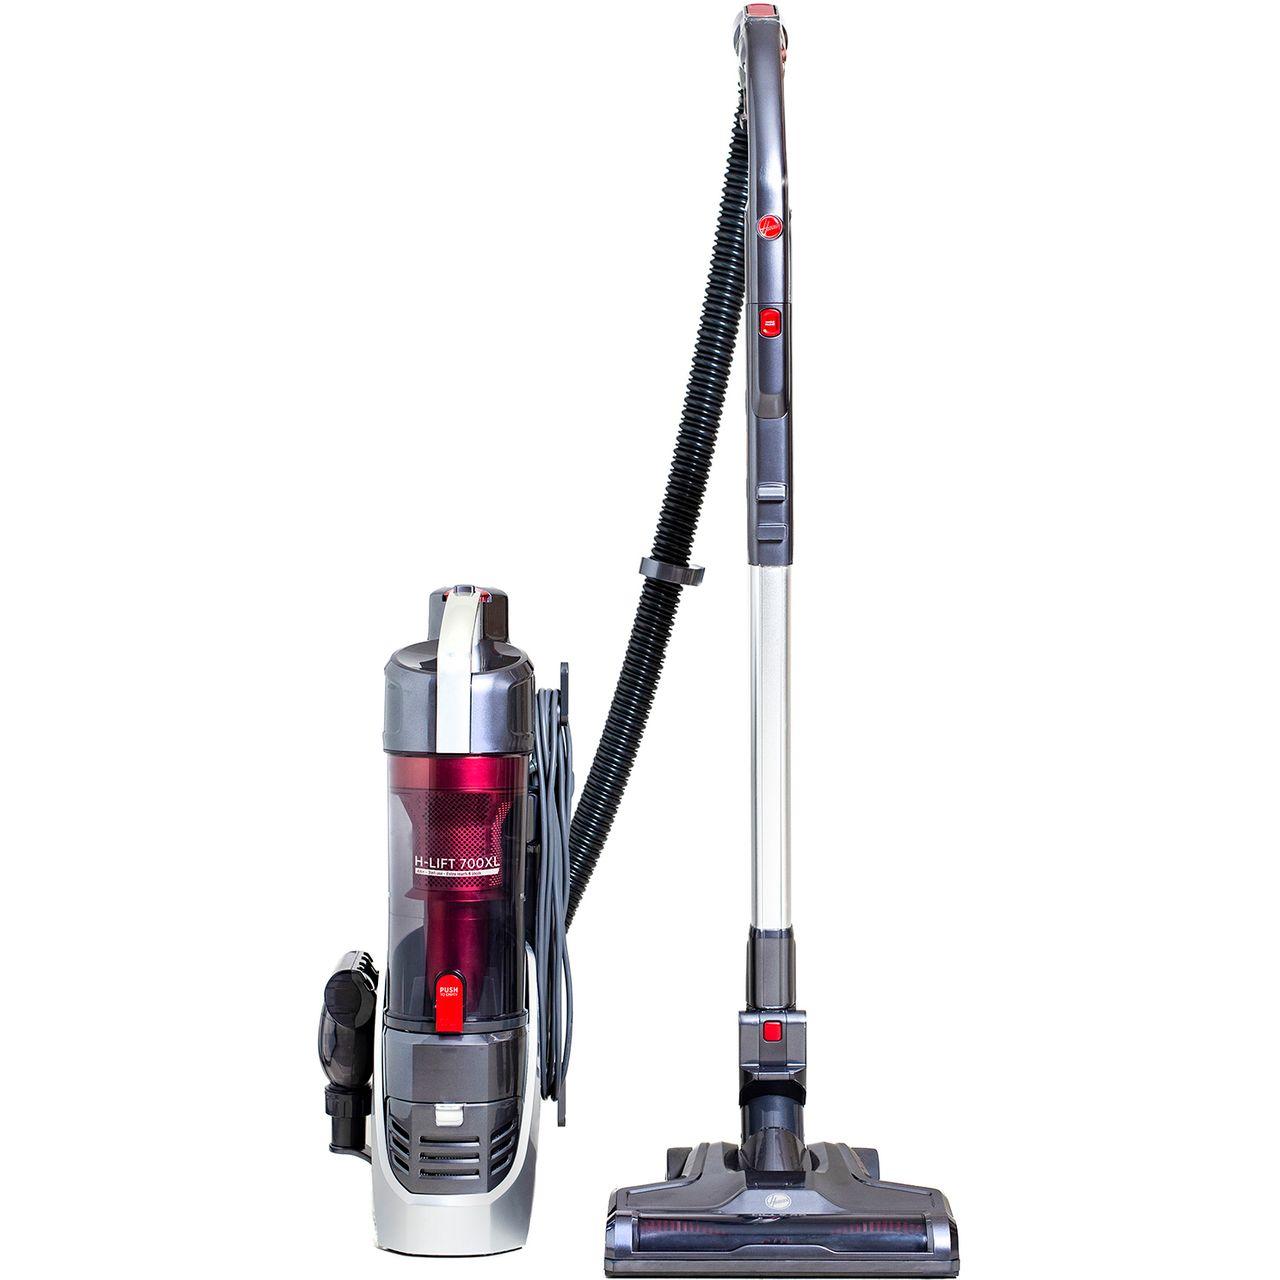 Hl700pxl Gyrd Hoover Upright Vacuum Cleaner Ao Com